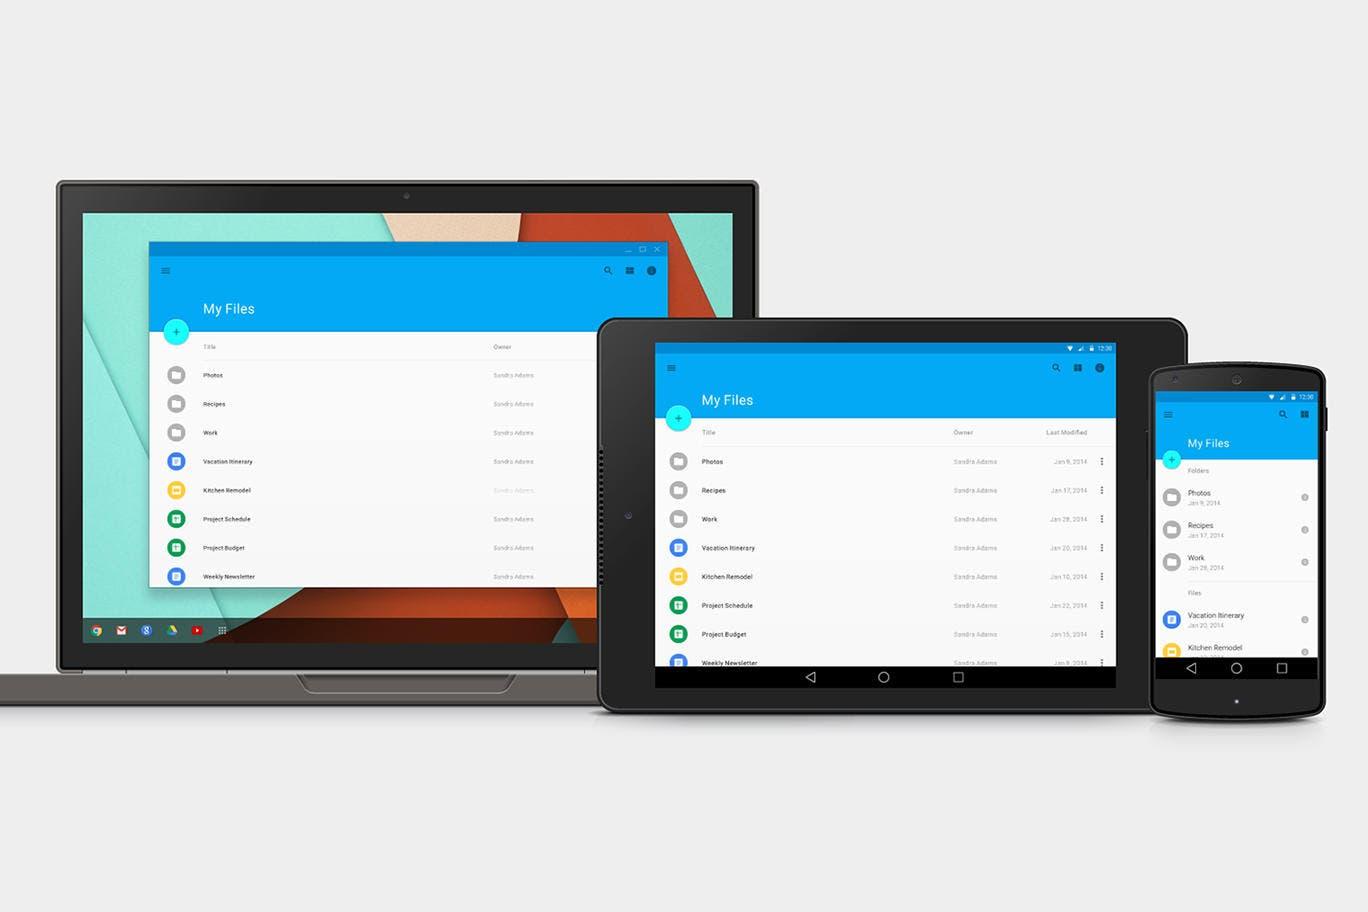 Google I/O Android L Design